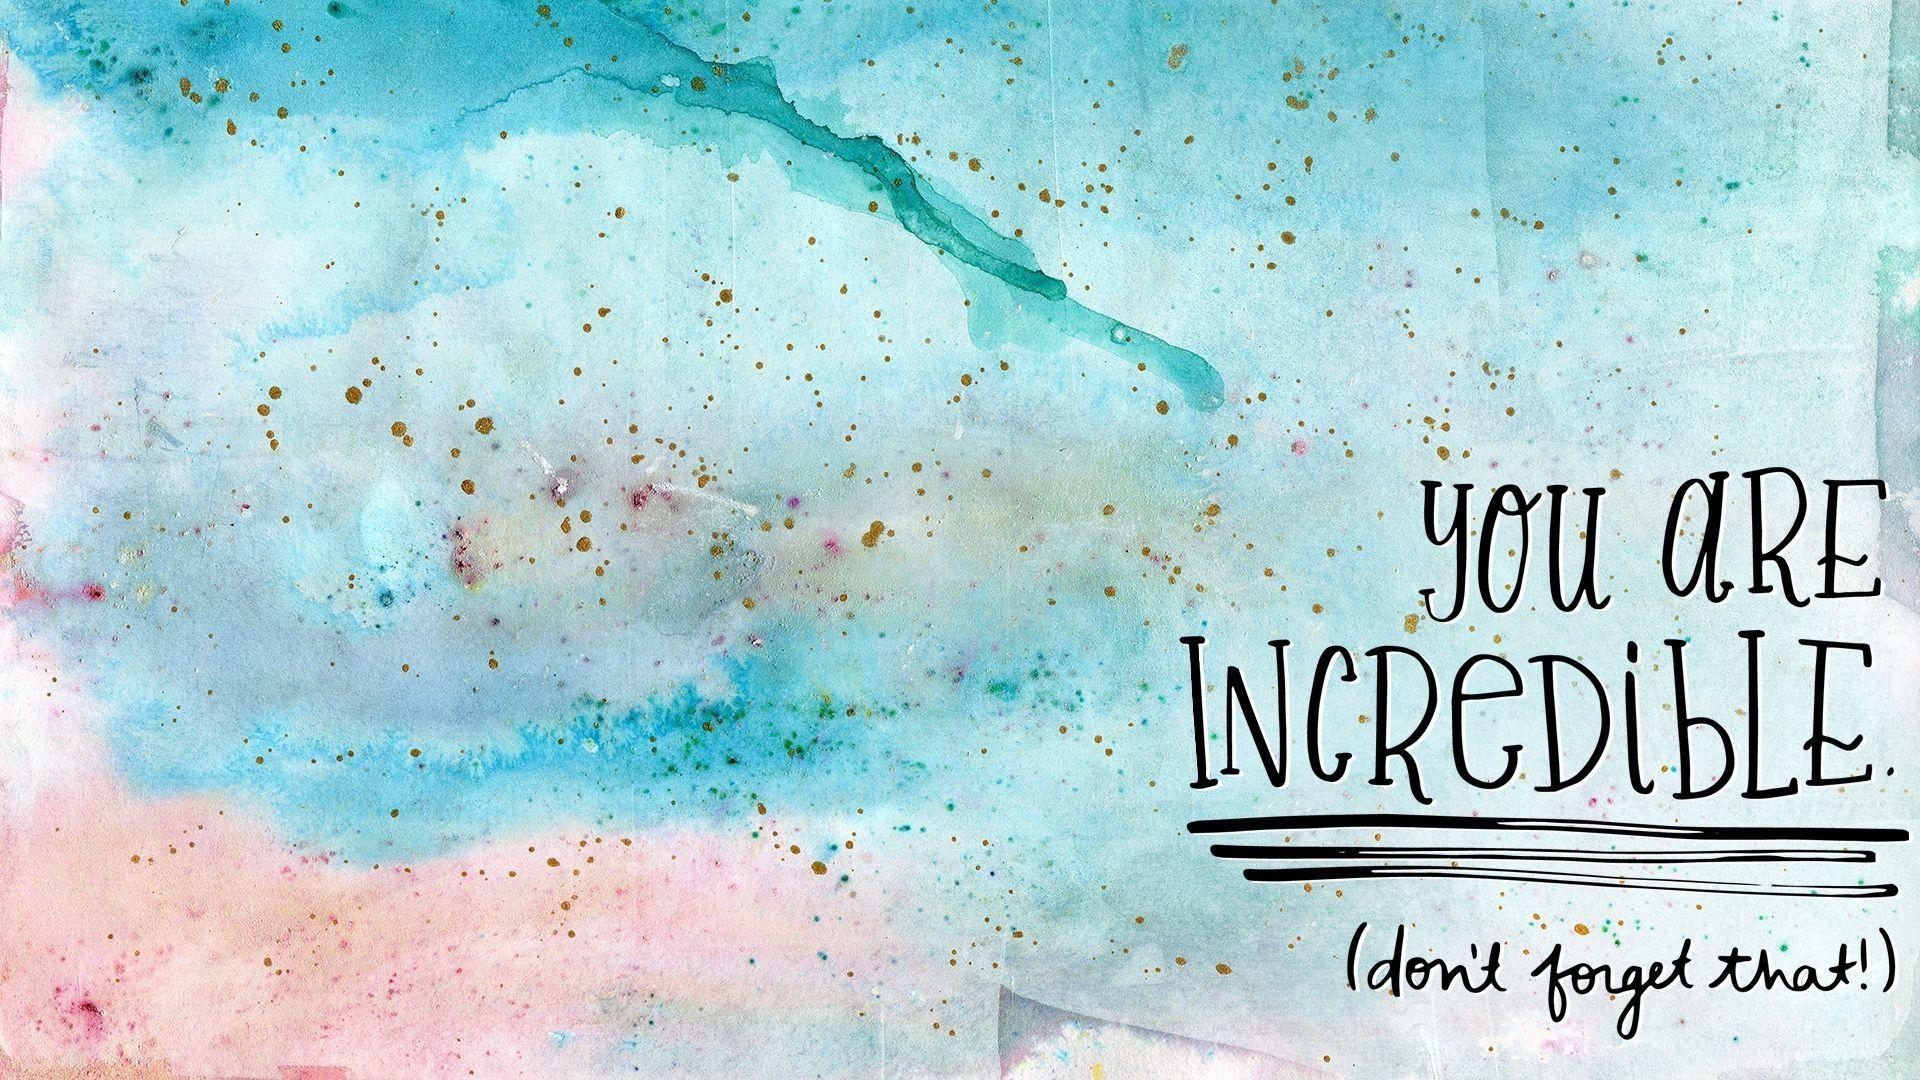 Inspirational Laptop Wallpapers Top Free Inspirational Laptop Backgrounds Wallpaperaccess